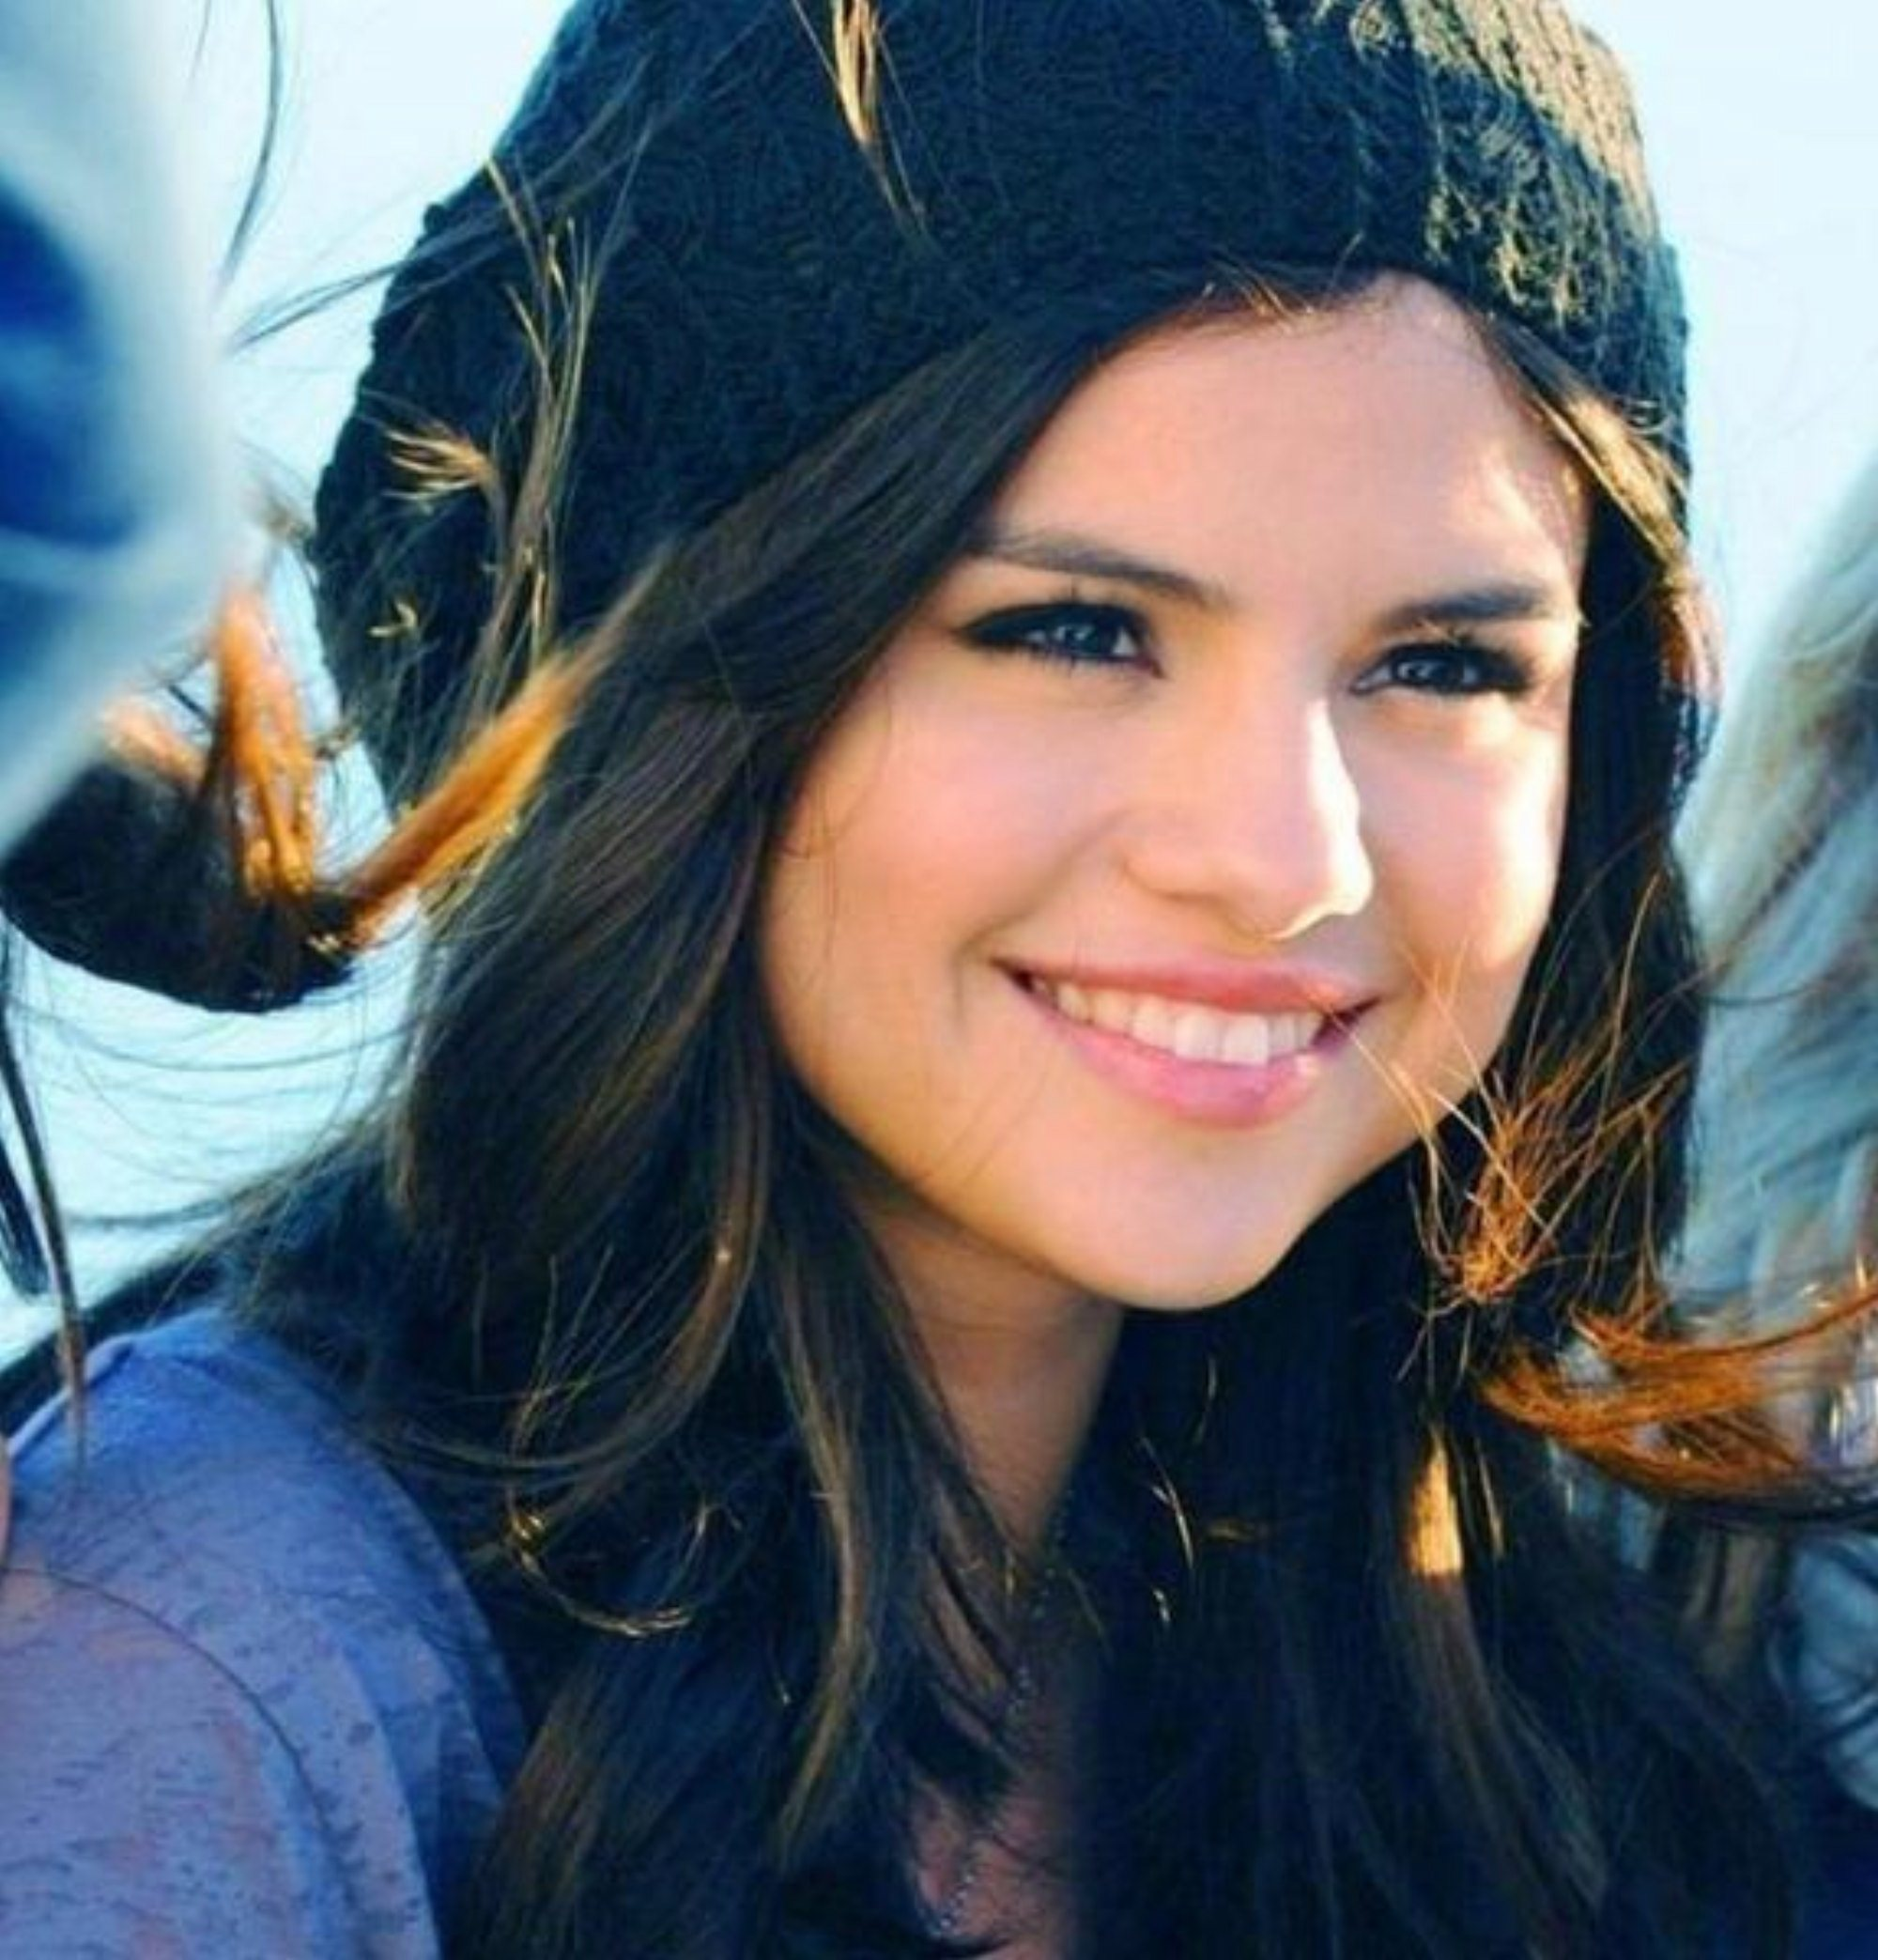 maquillage de Selena Gomez